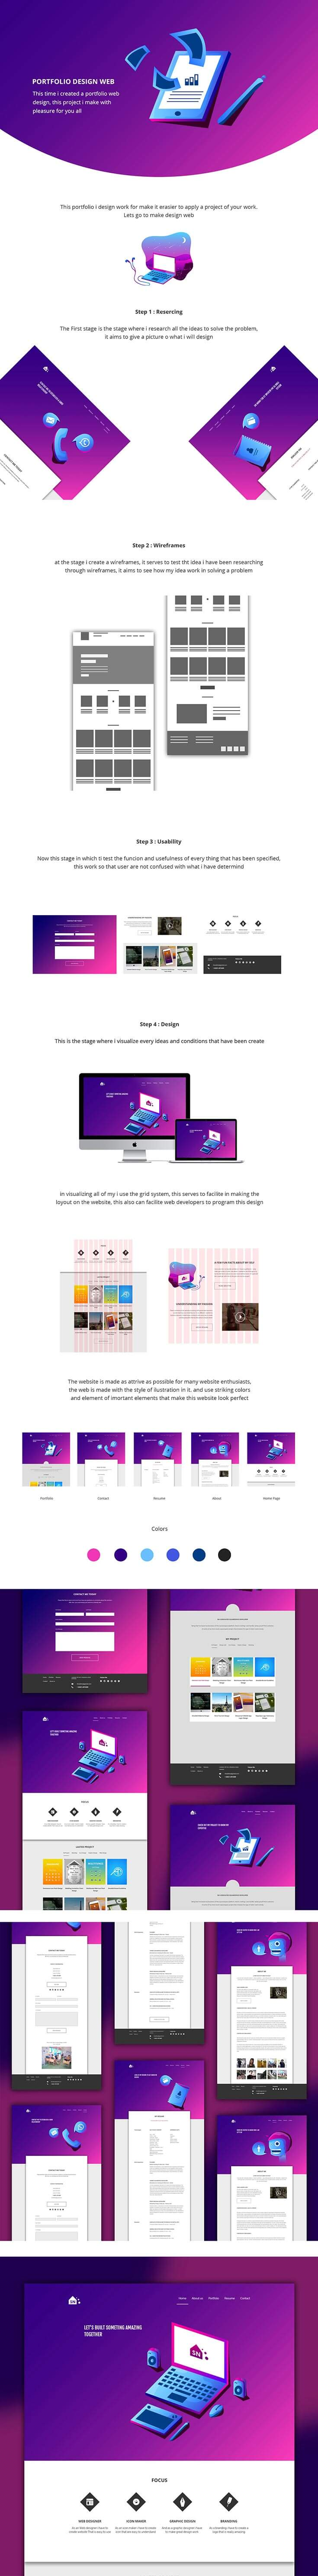 Free Portfolio Design Web Page PSD